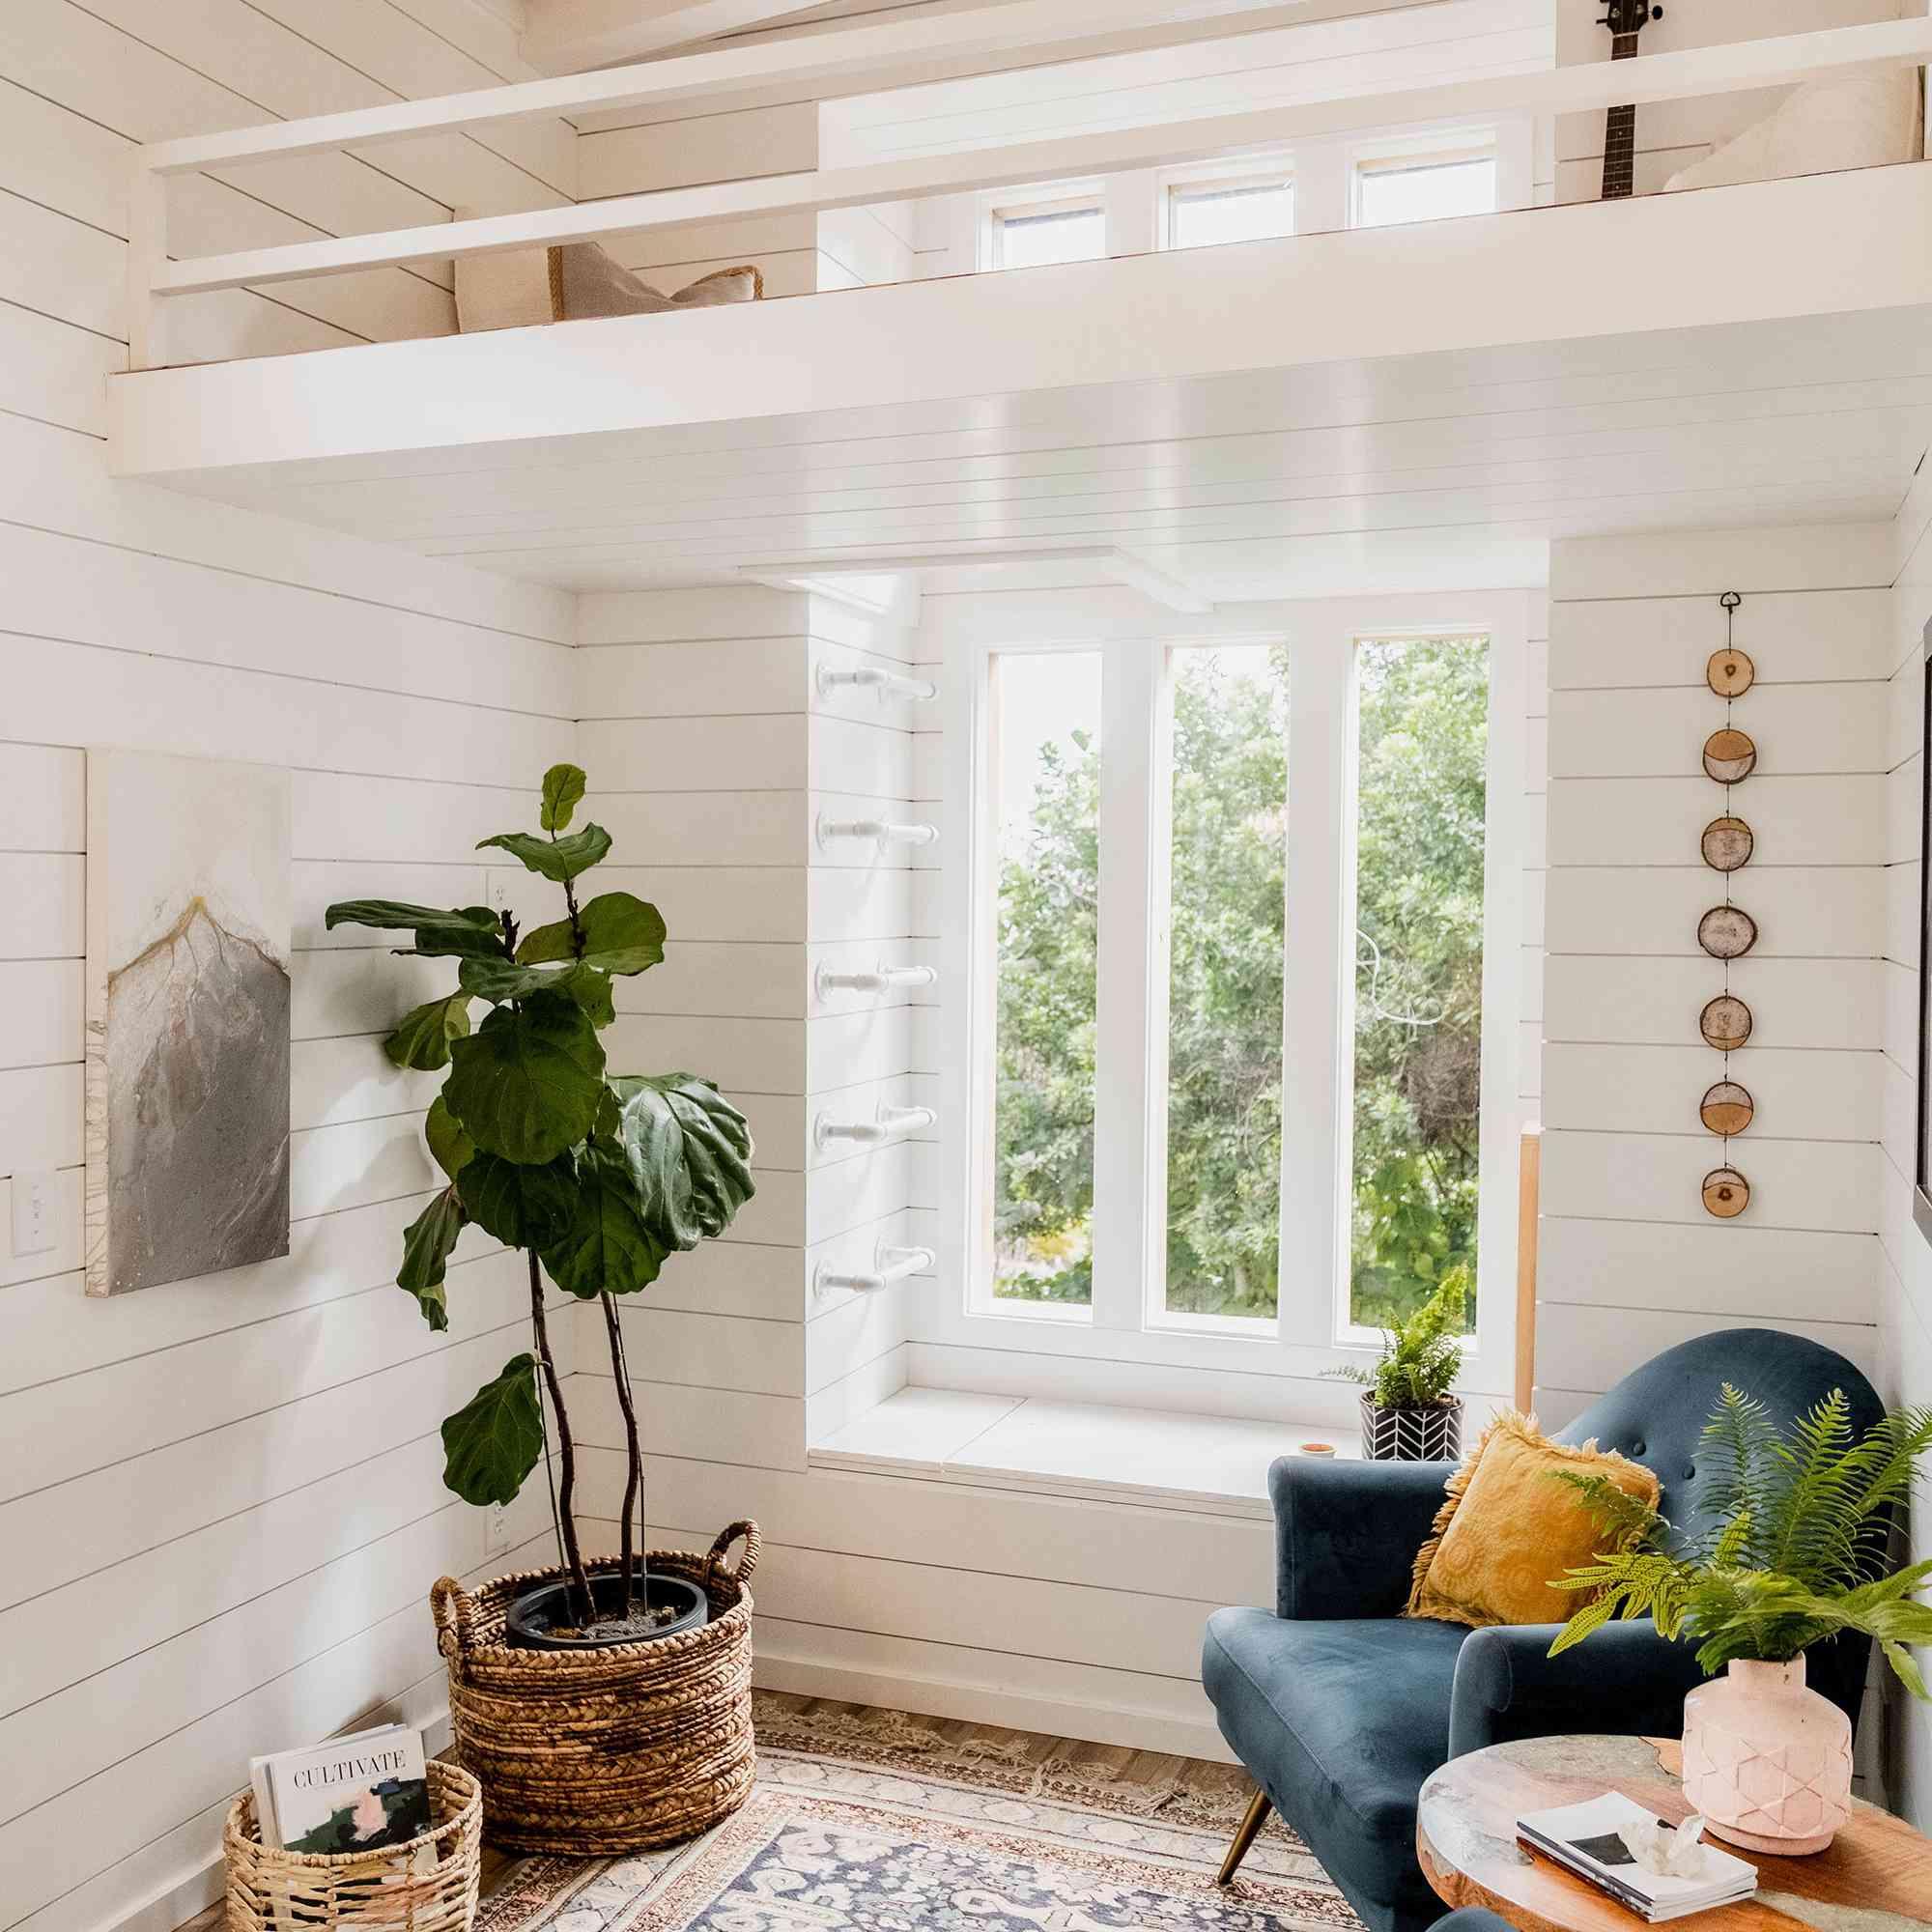 tiny house hawaii Taylor and Michaella McClendon secondary loft access